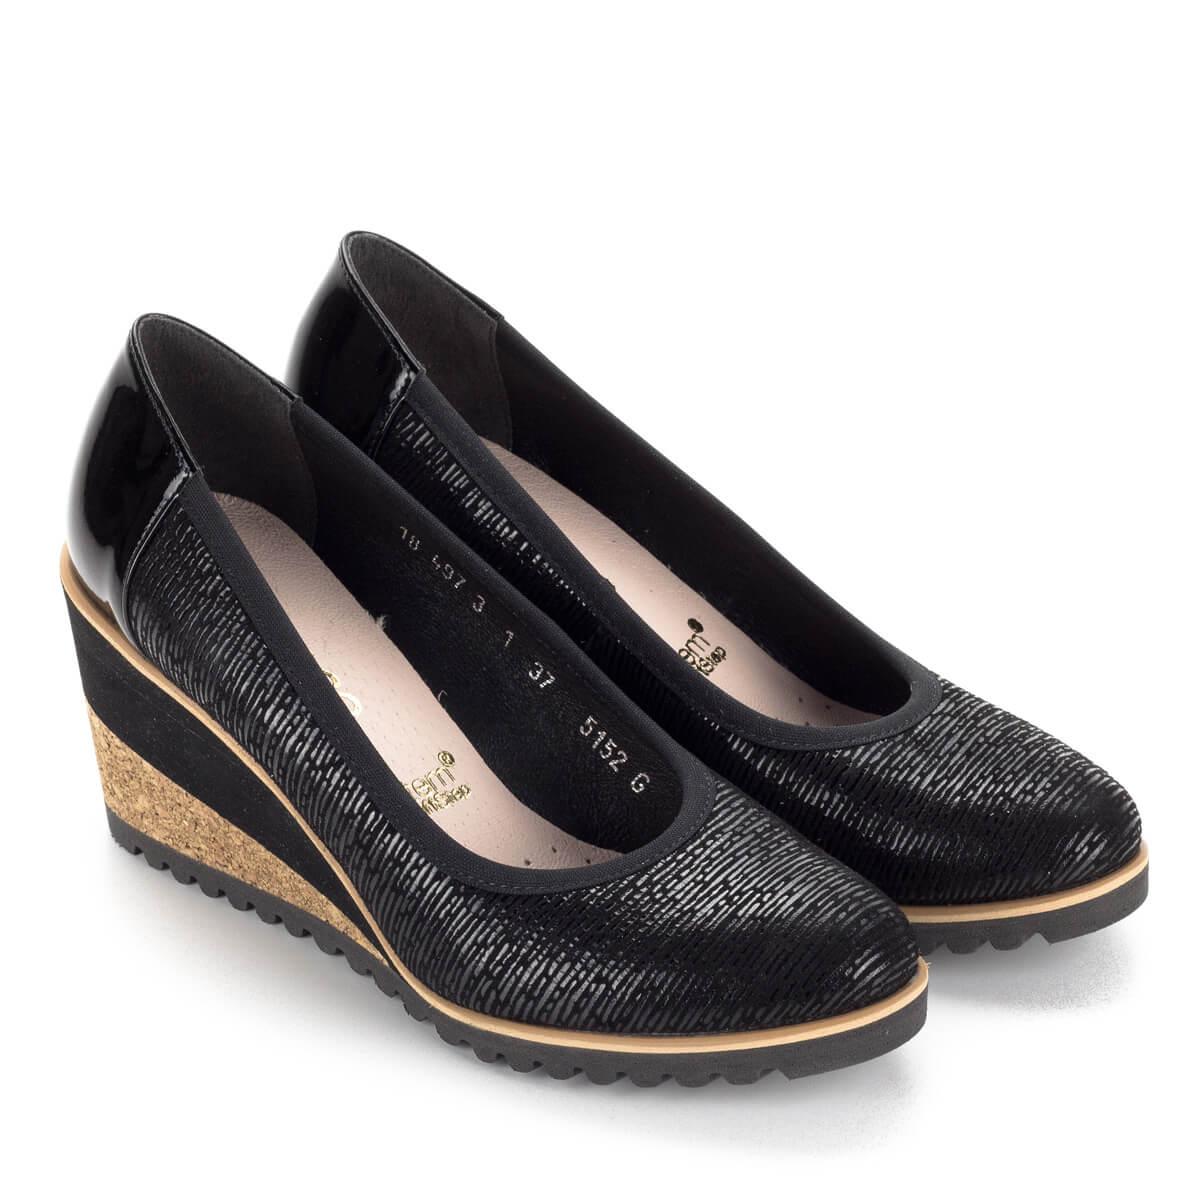 Fekete Bioeco női cipő 7 cm magas sarokkal. A telitalpú cipő